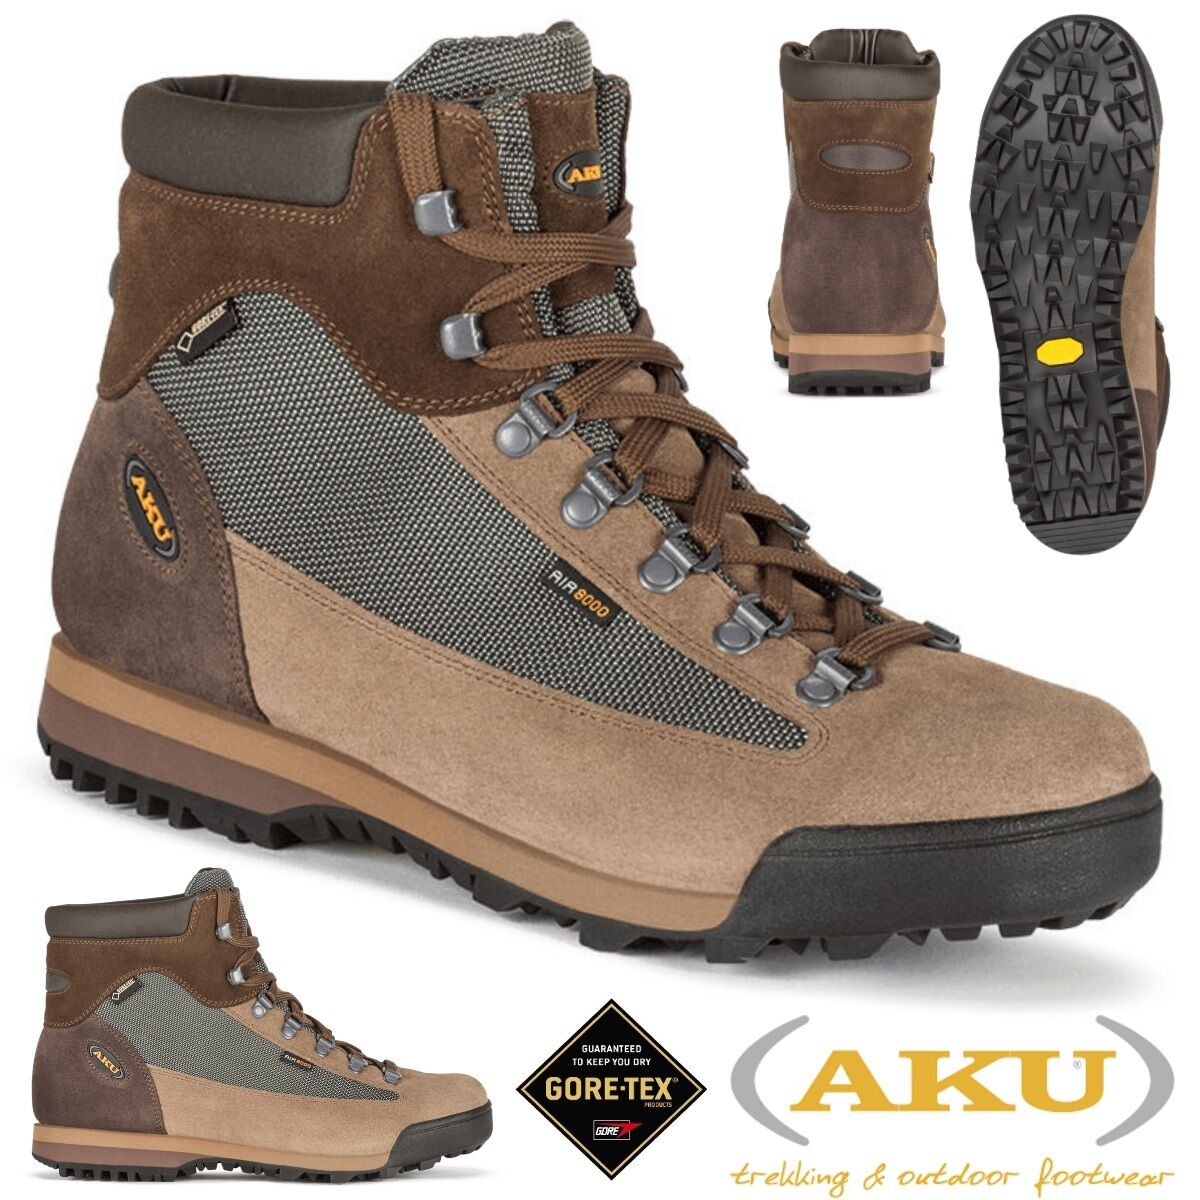 Zapatos 885.4 AKU SLOPE GTX Anfibi 885.4 Zapatos Scarponcini Trekking botas Anfibi 8fa8a4